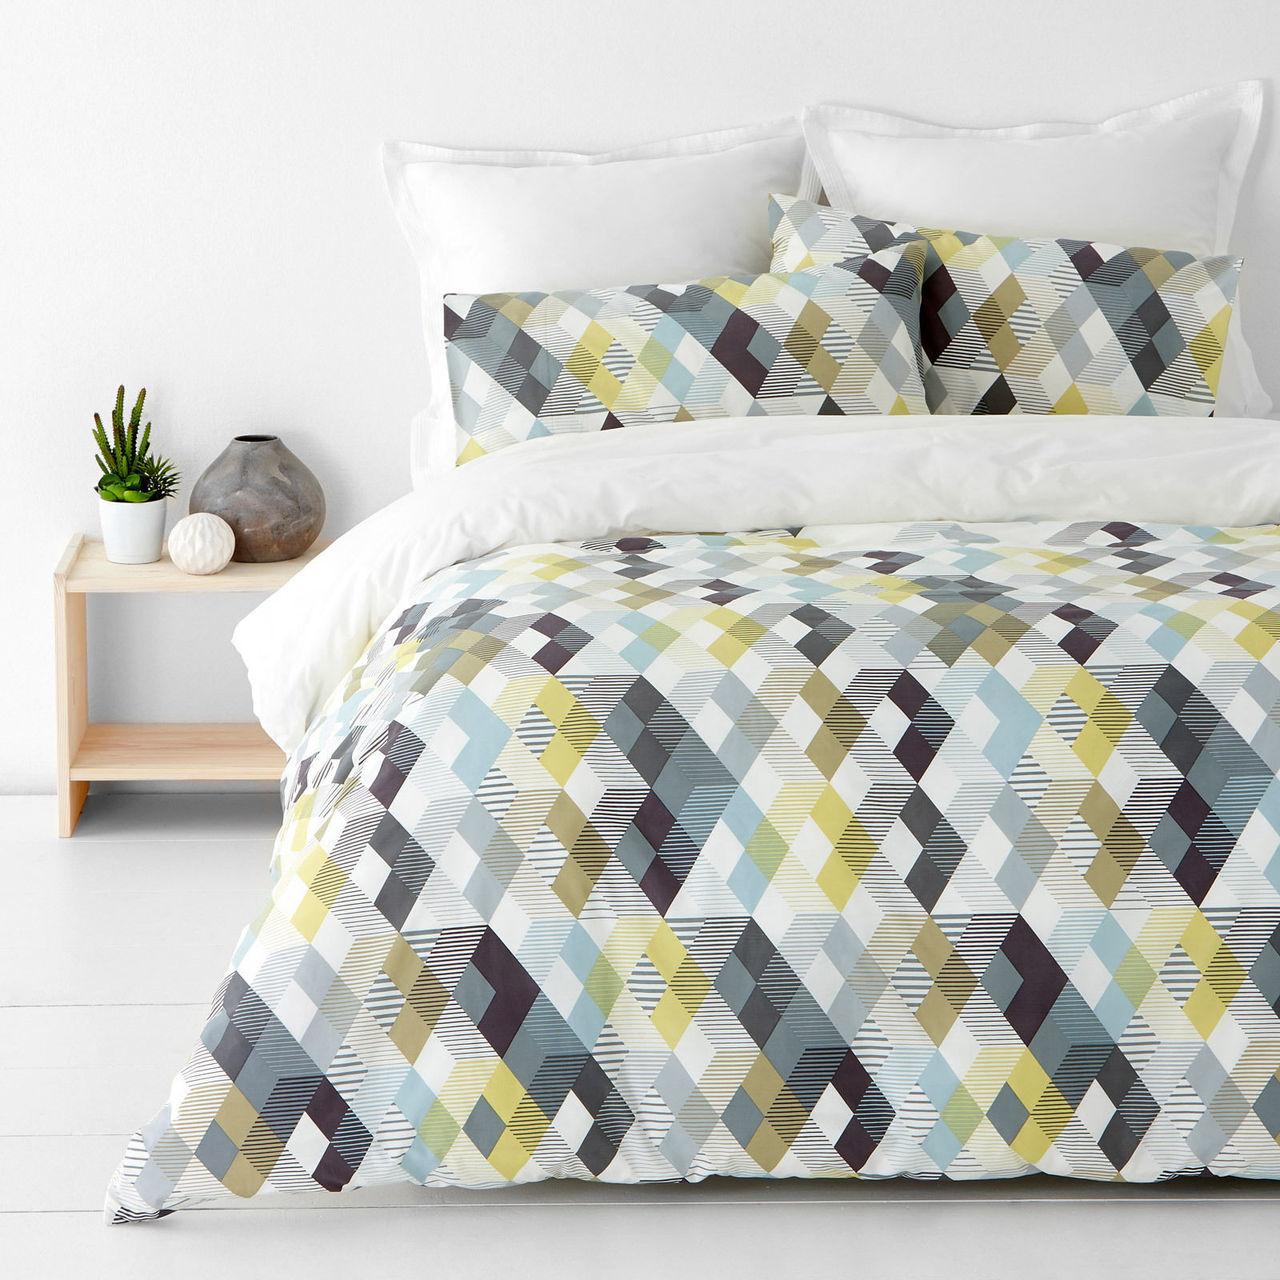 In 2 Linen Kensington Grey King Bed Quilt Cover Set